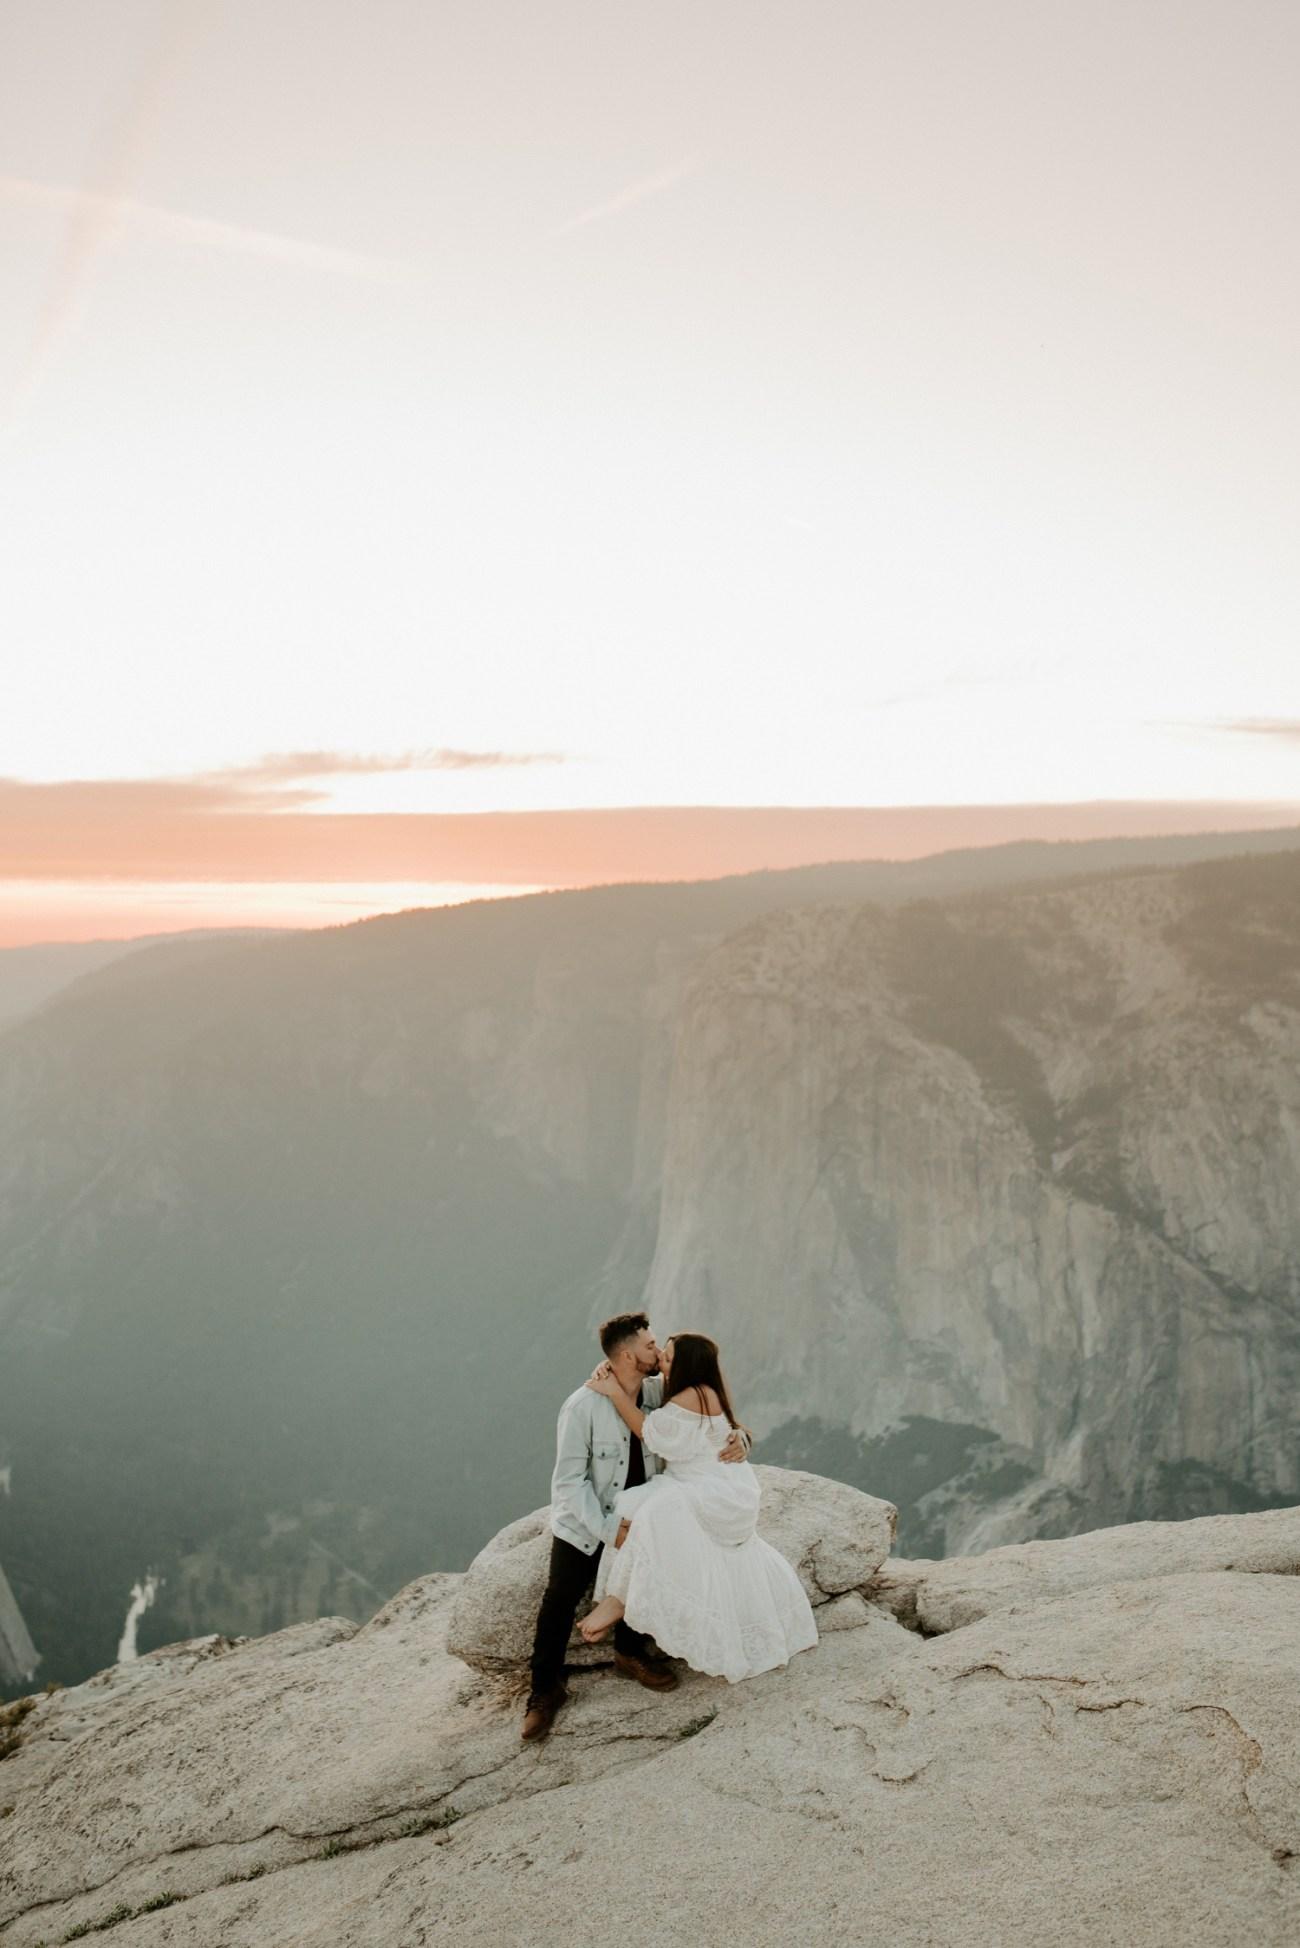 Yosemite Taft Point Engagement Session California Wedding Photographer Anais Possamai Photography 39